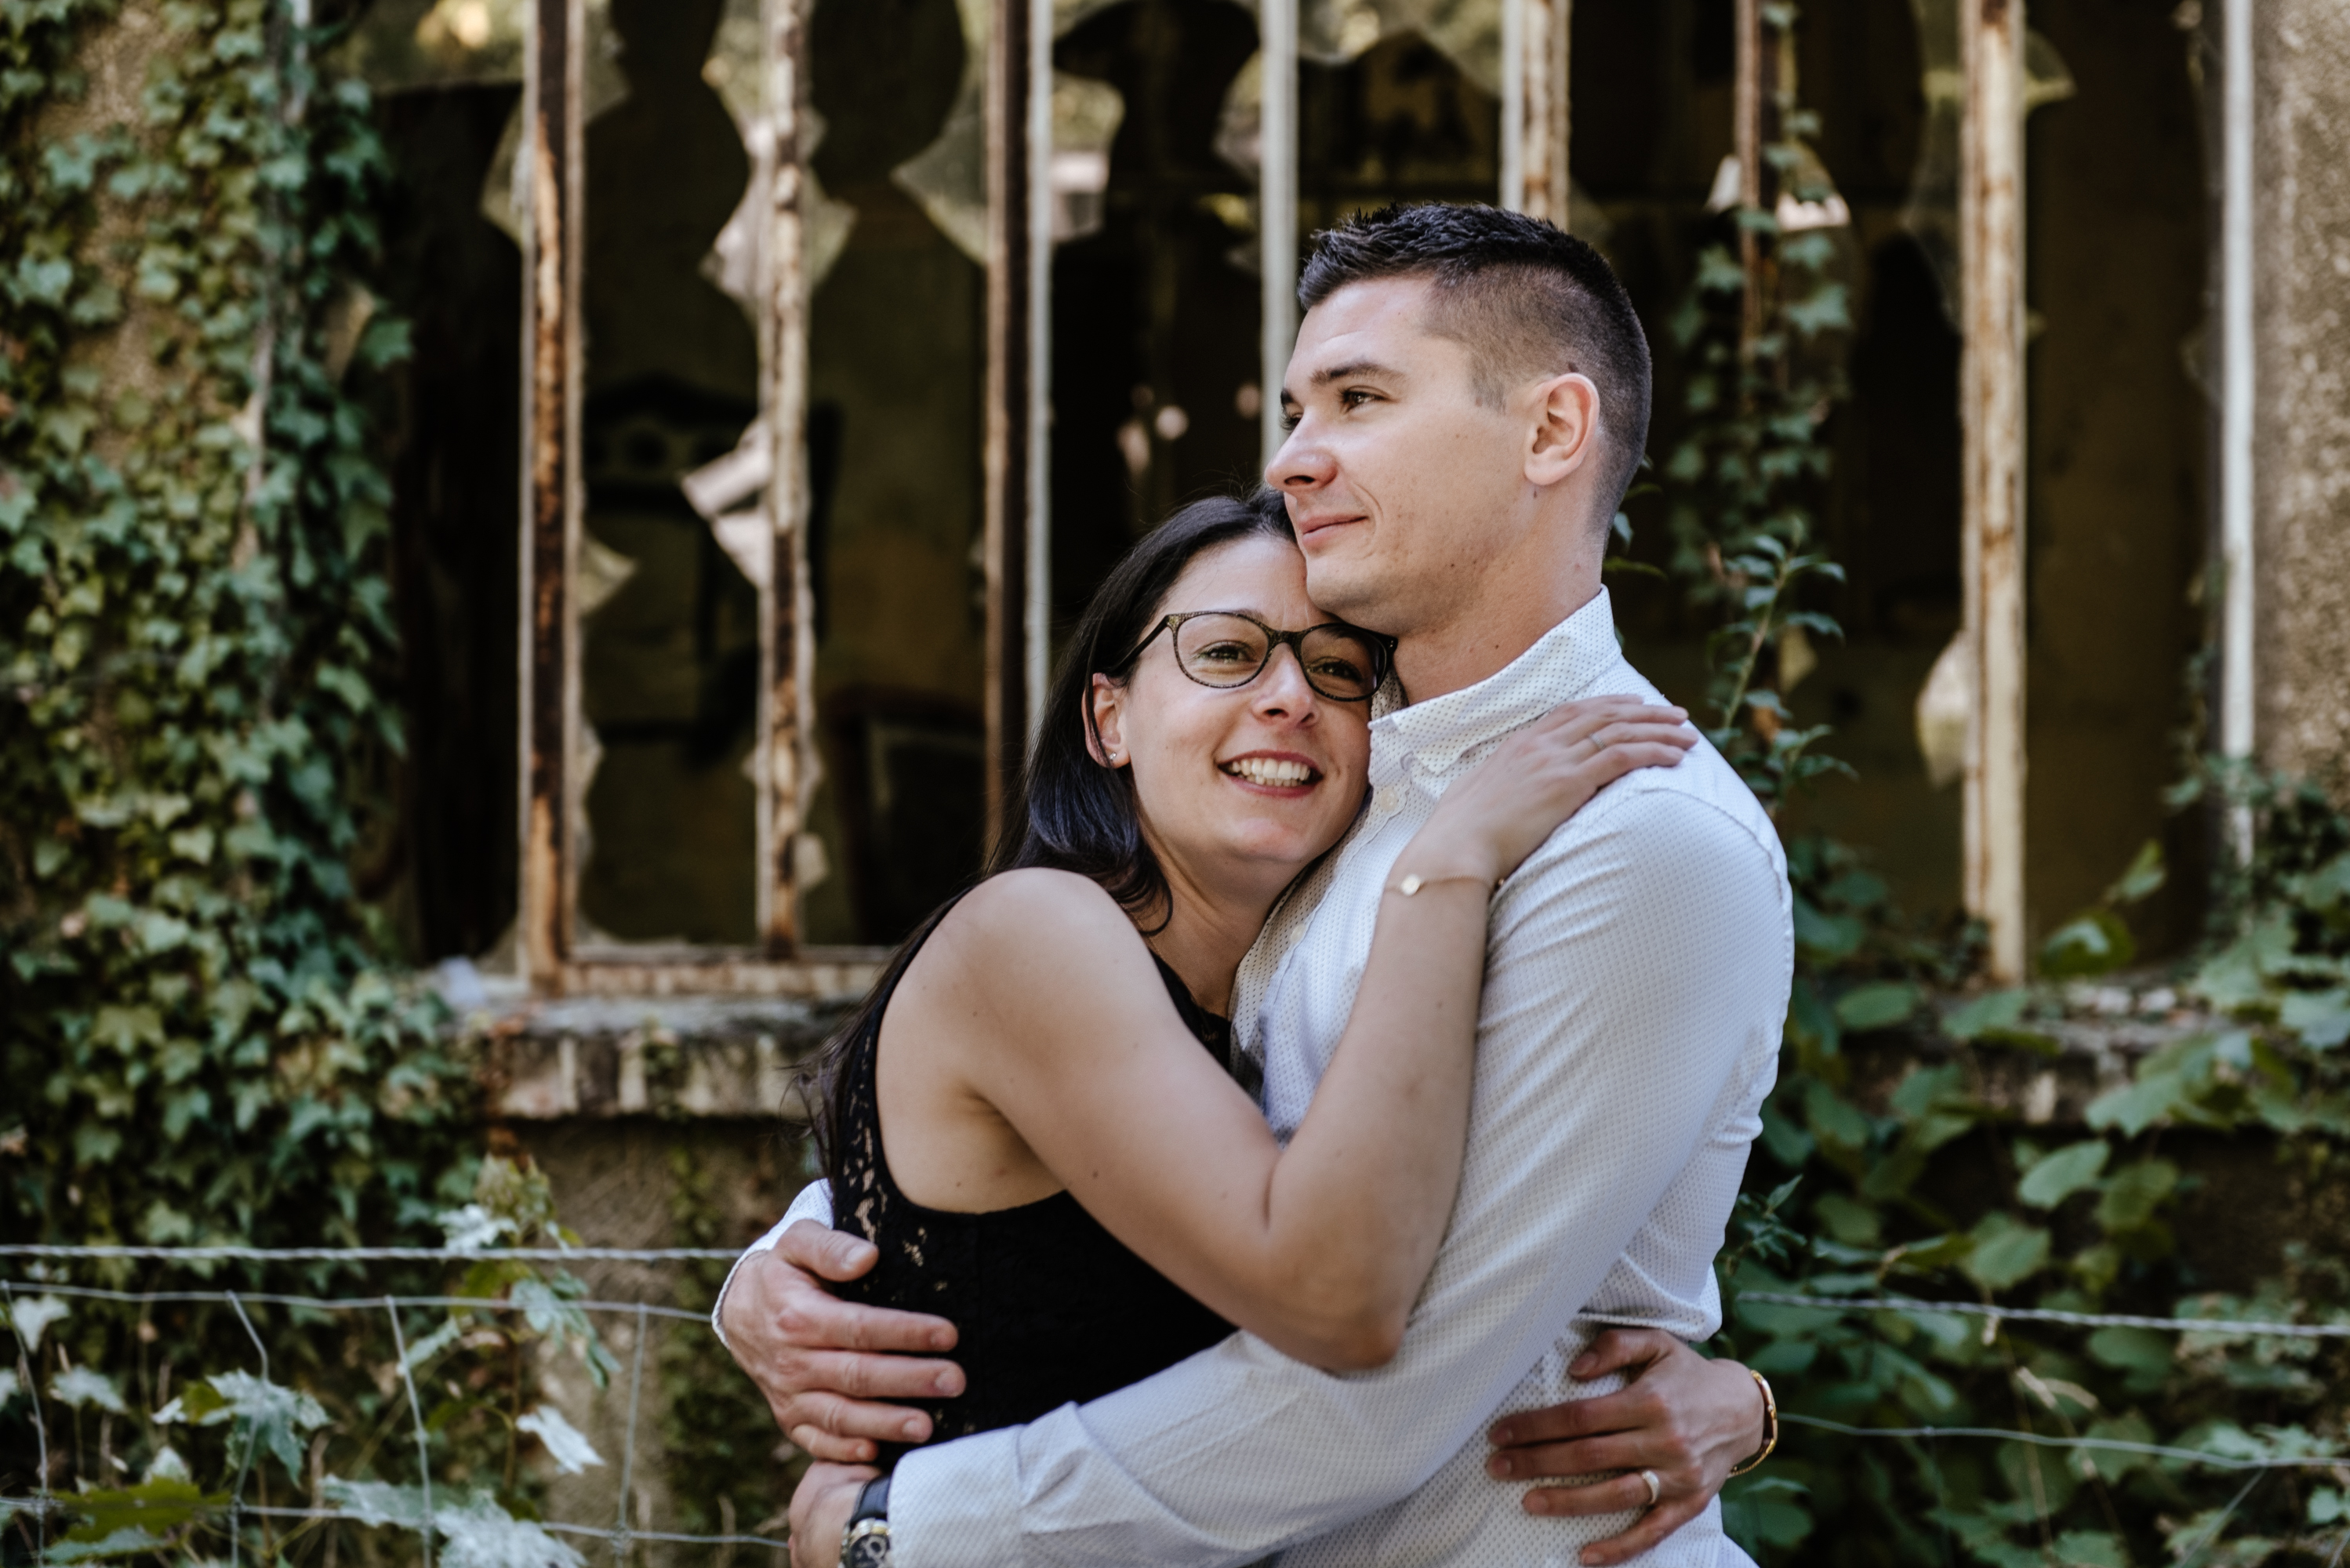 julie-photographe-couple-fontenay-sous-bois-15